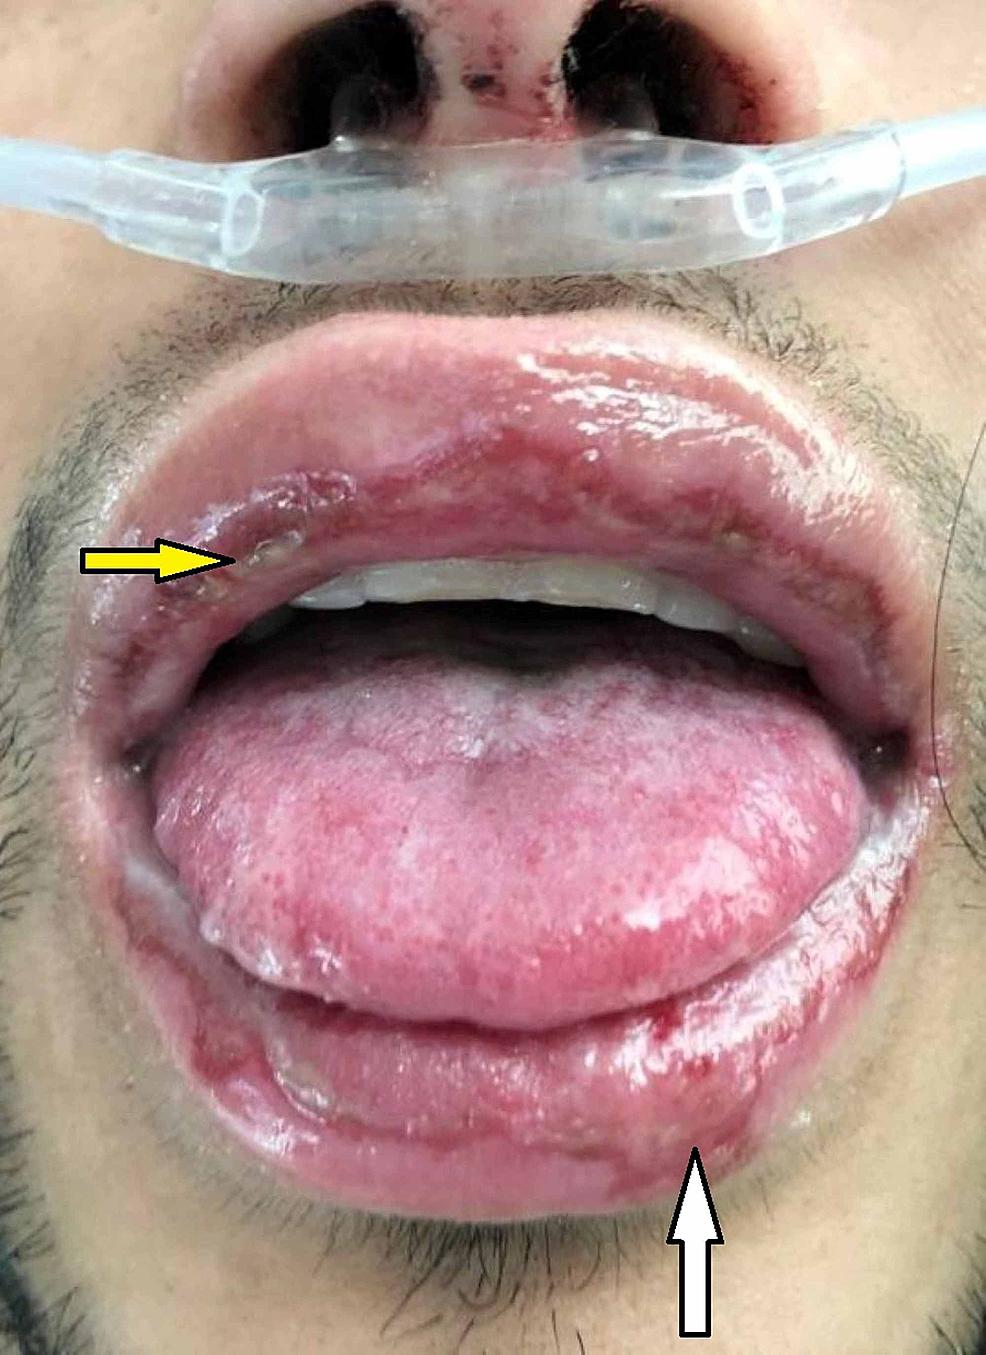 Initial-facial-examination